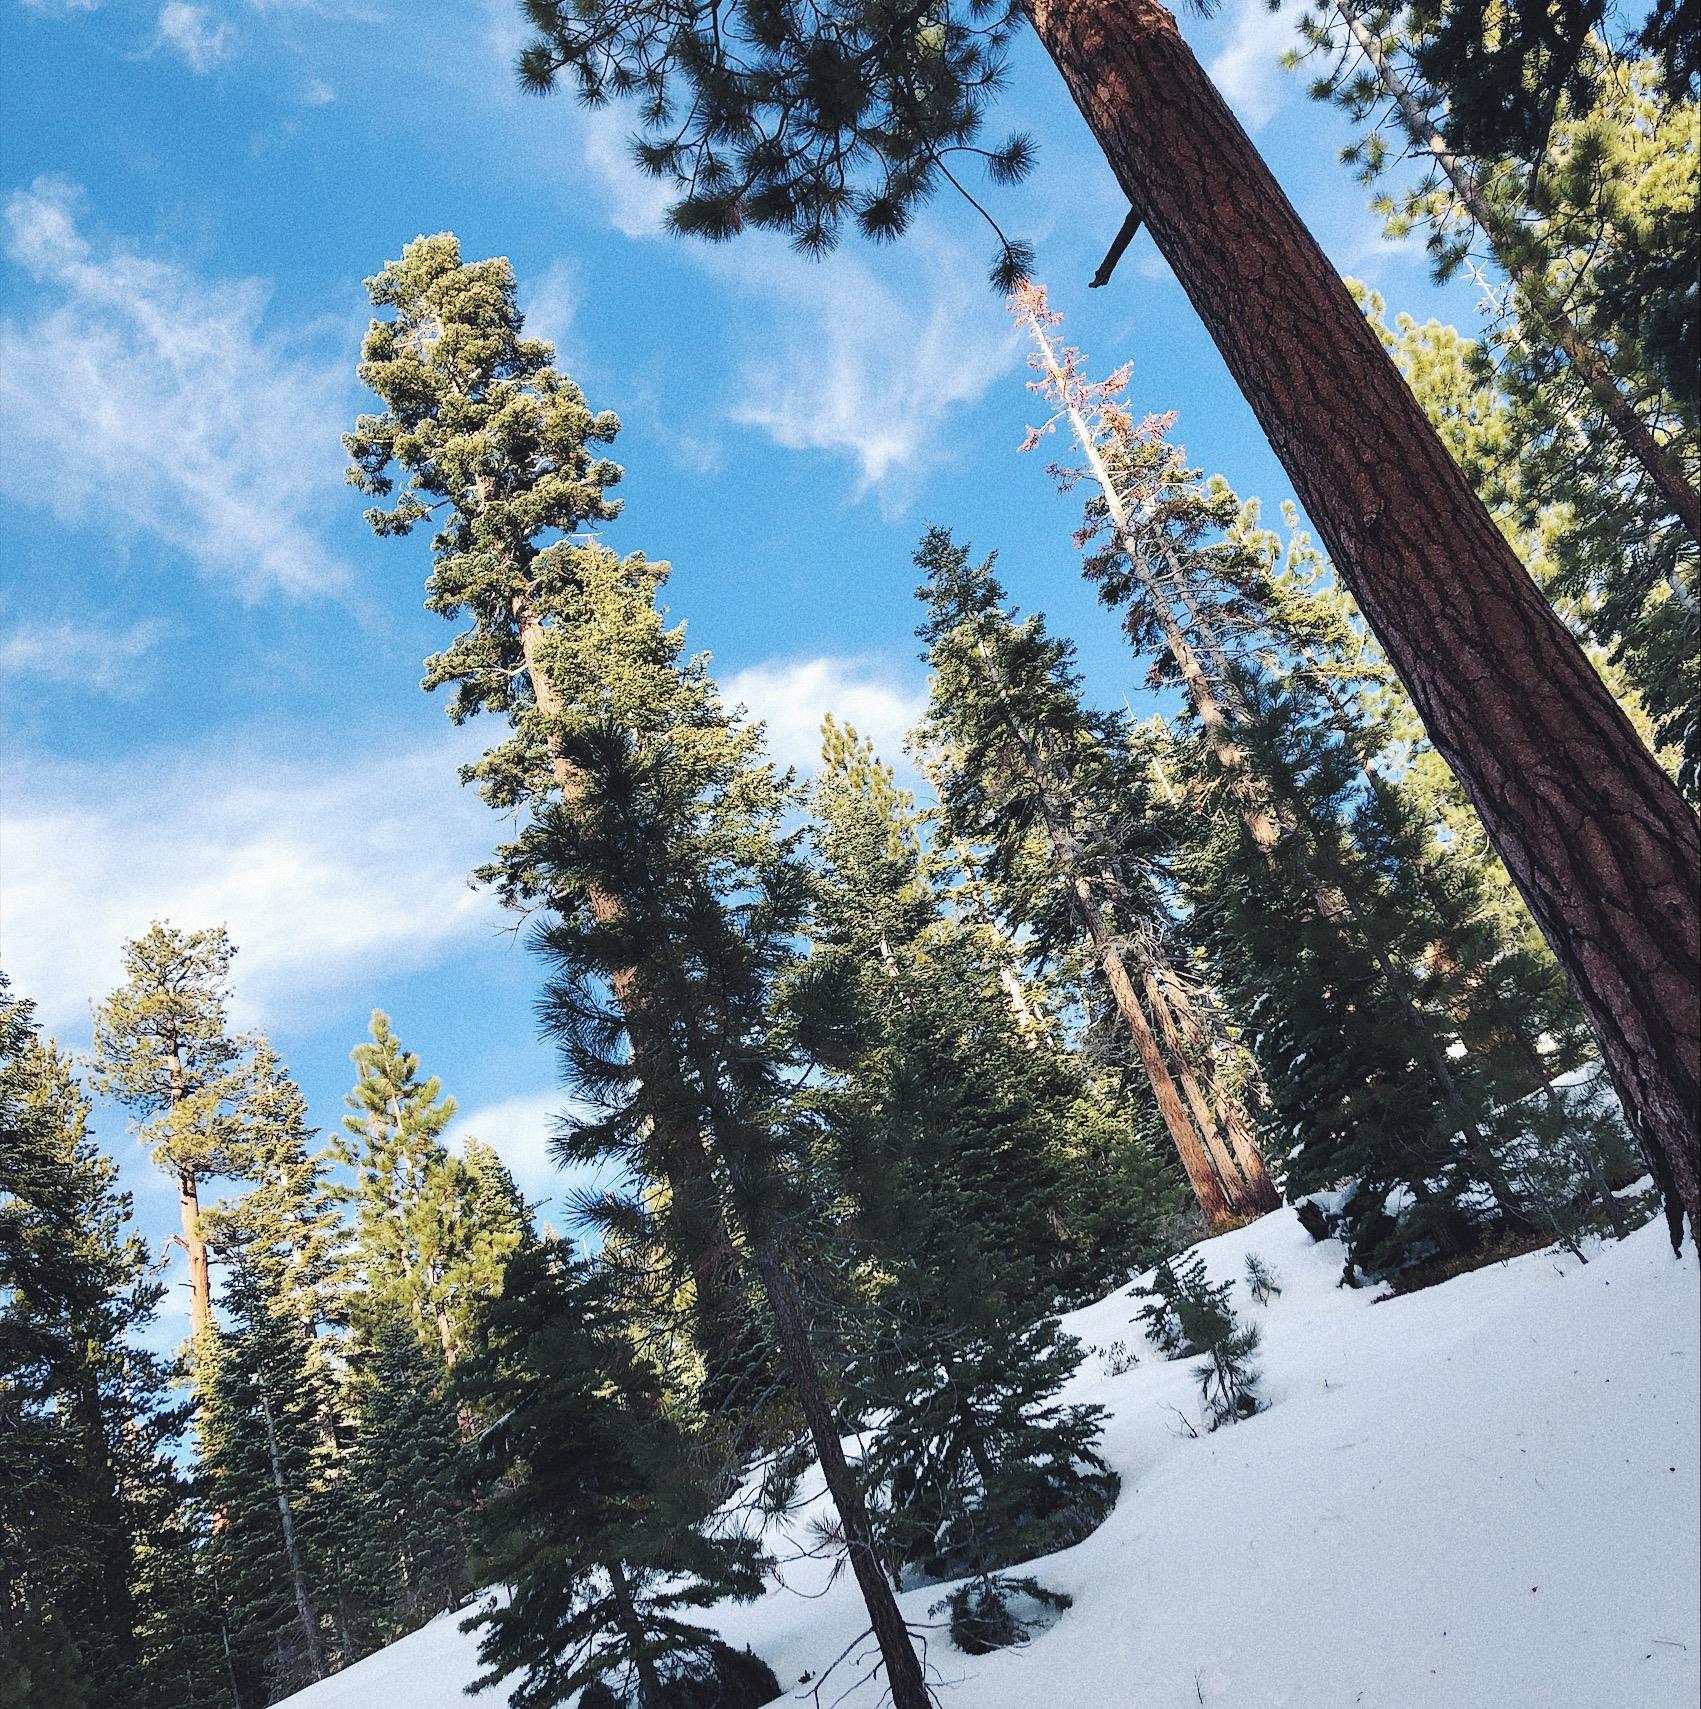 Snowshoeing the Tahoe Rim Trail in South Lake Tahoe.